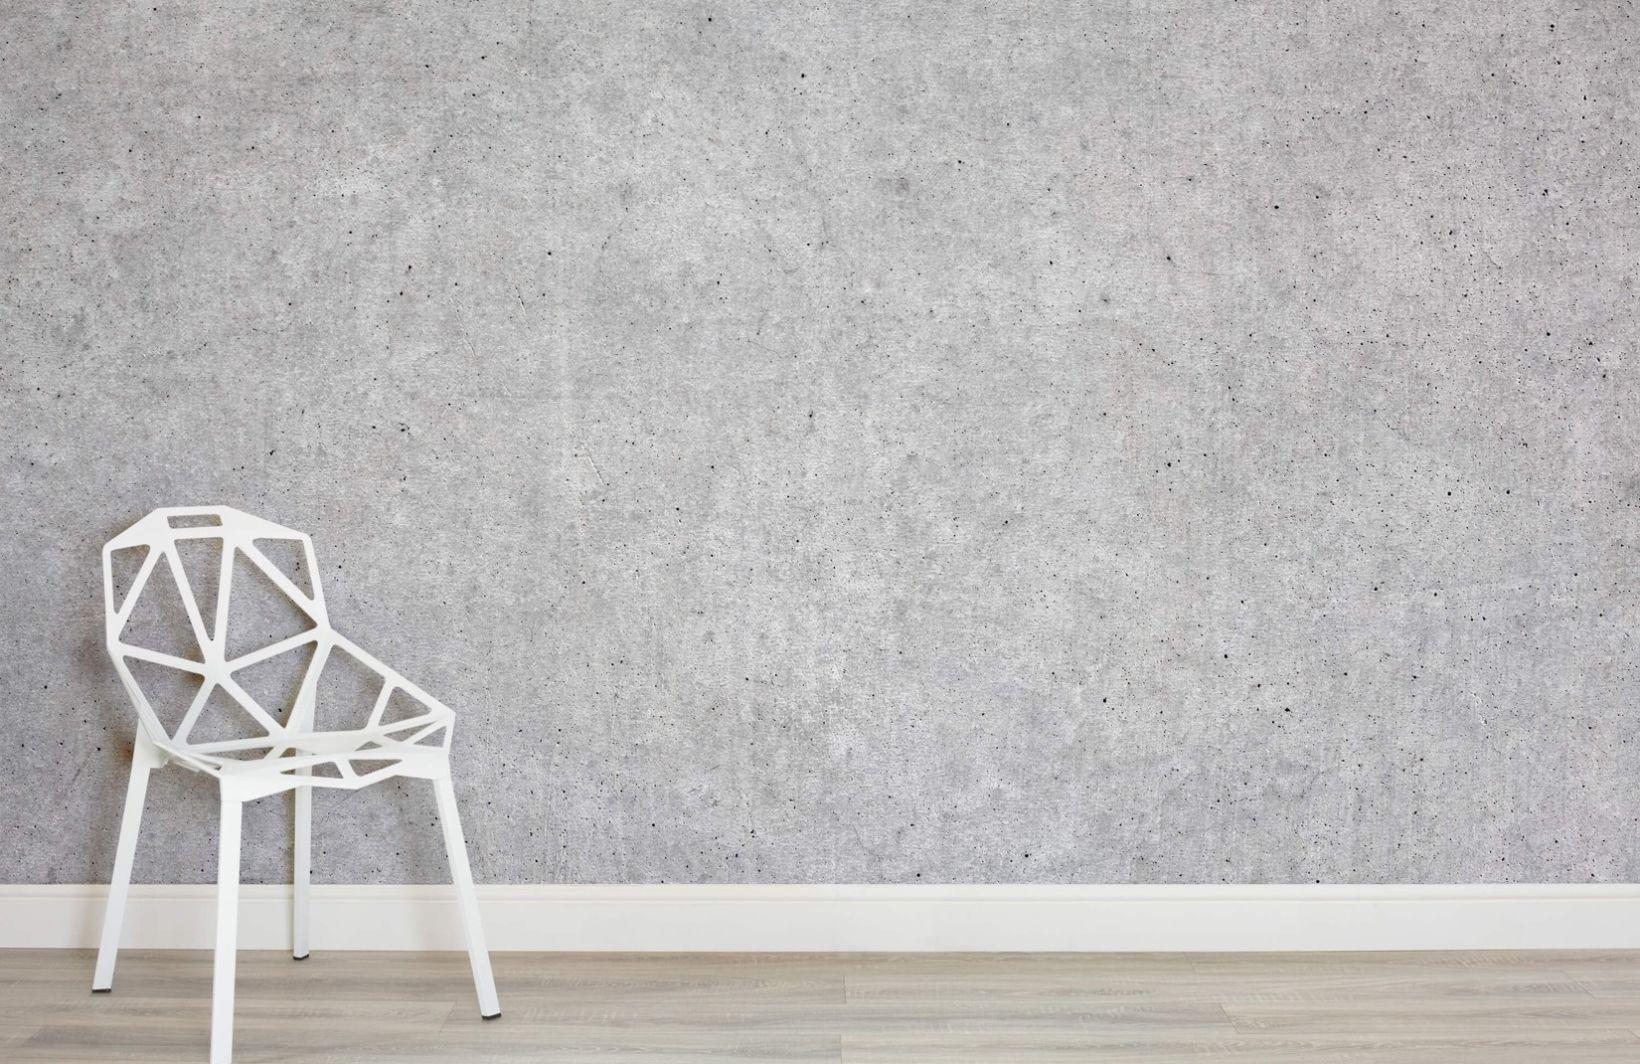 Rustic Concrete Textures Room